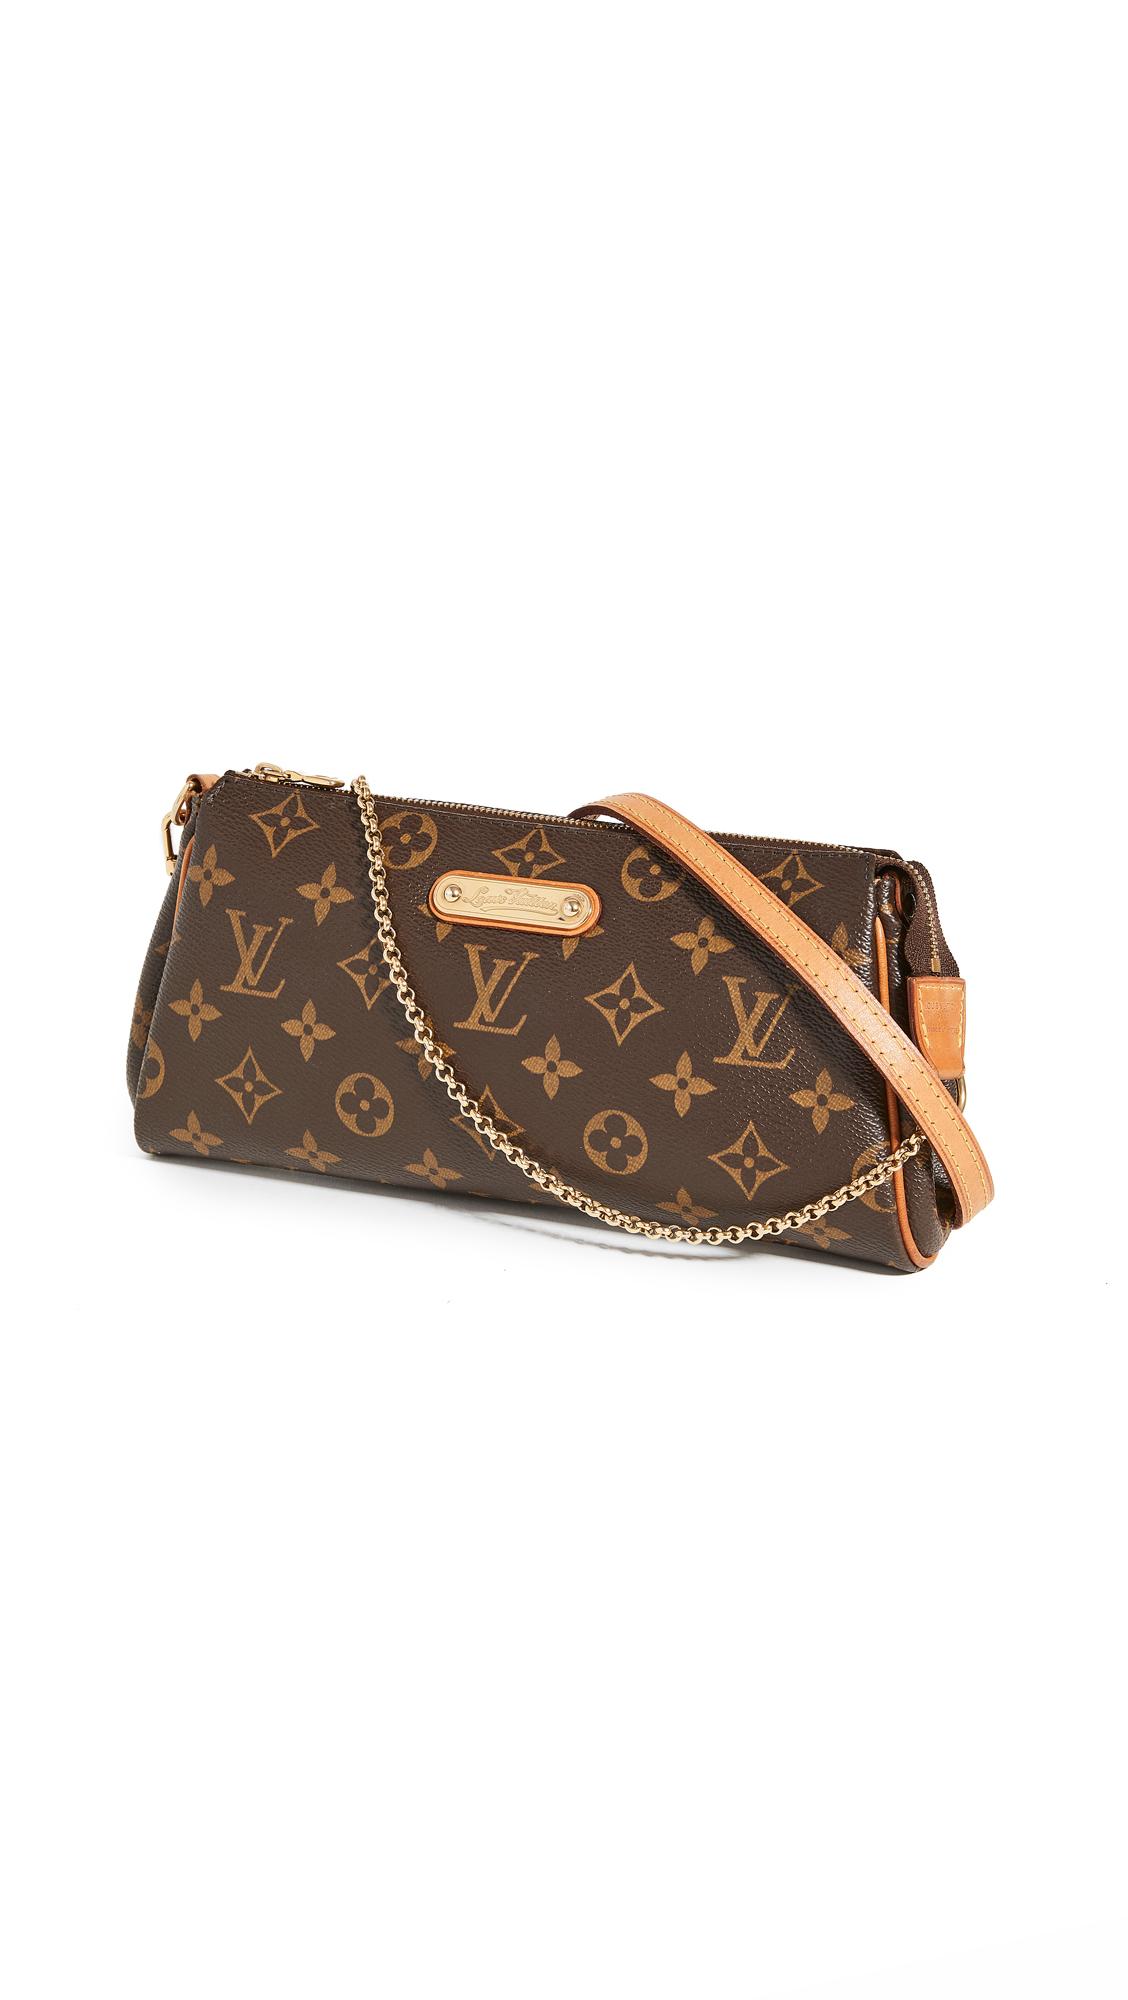 Pre-owned Louis Vuitton Monogram Eva Bag In Brown